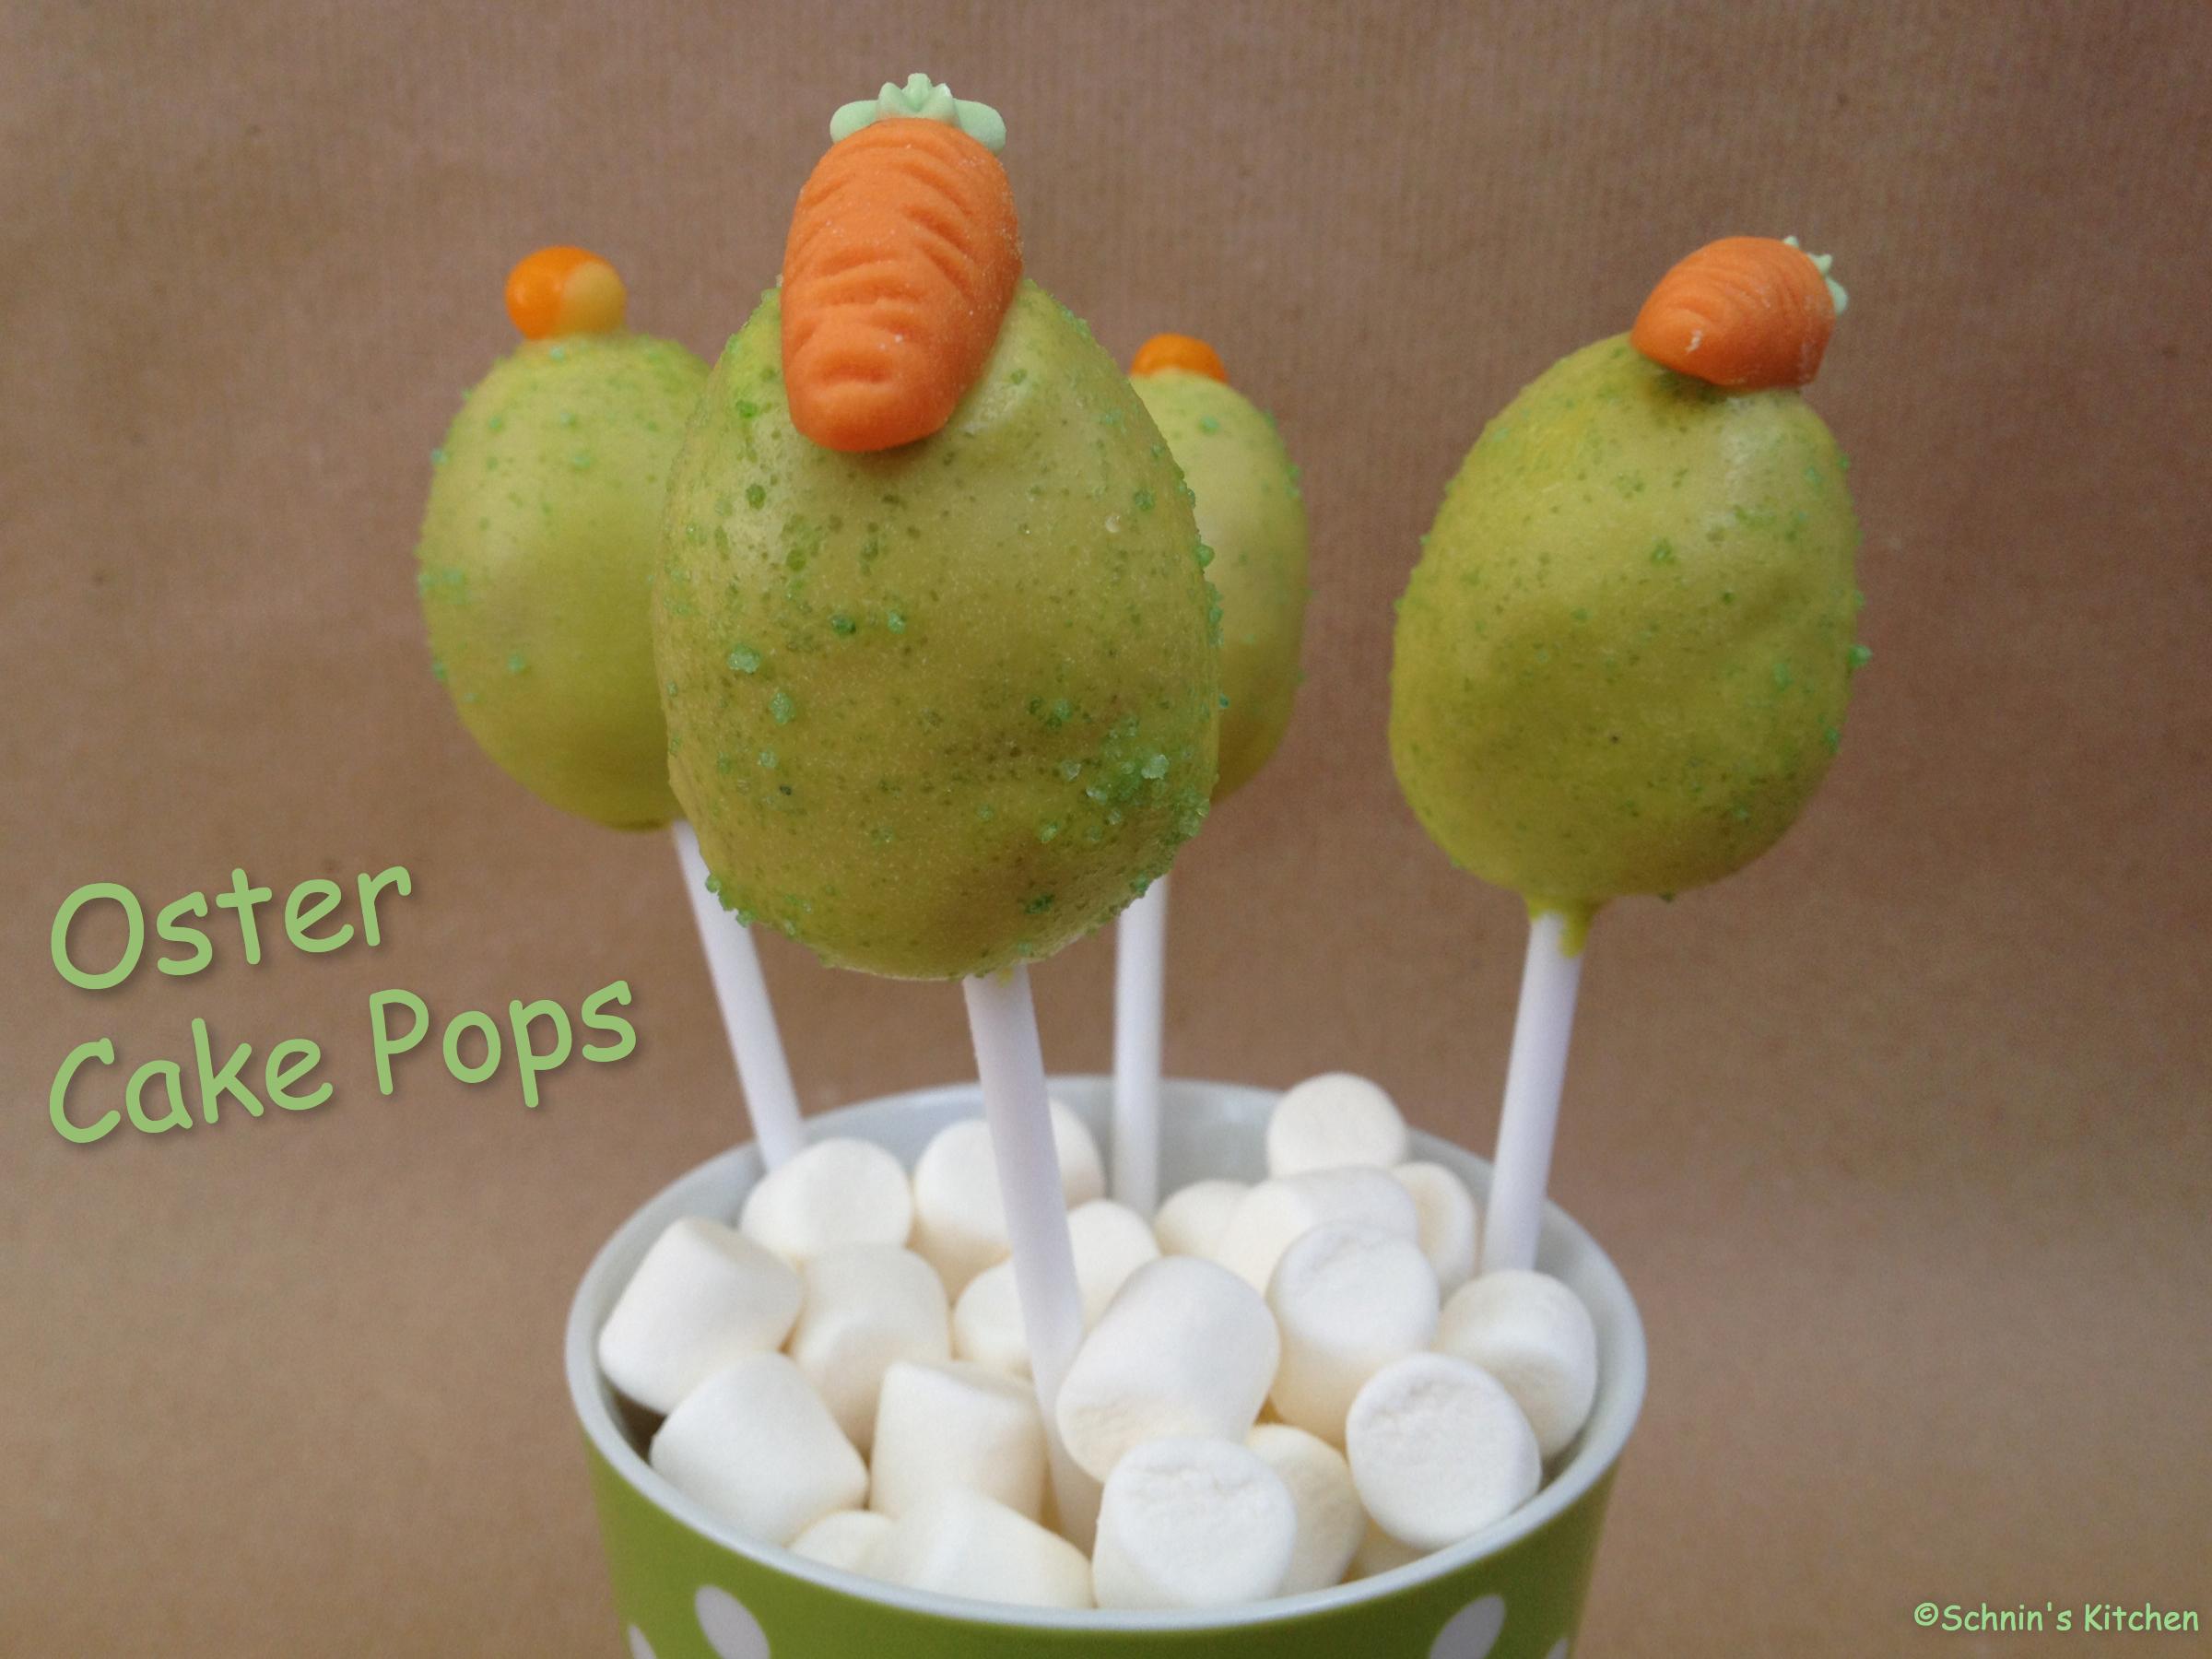 Oster-Cake-Pop